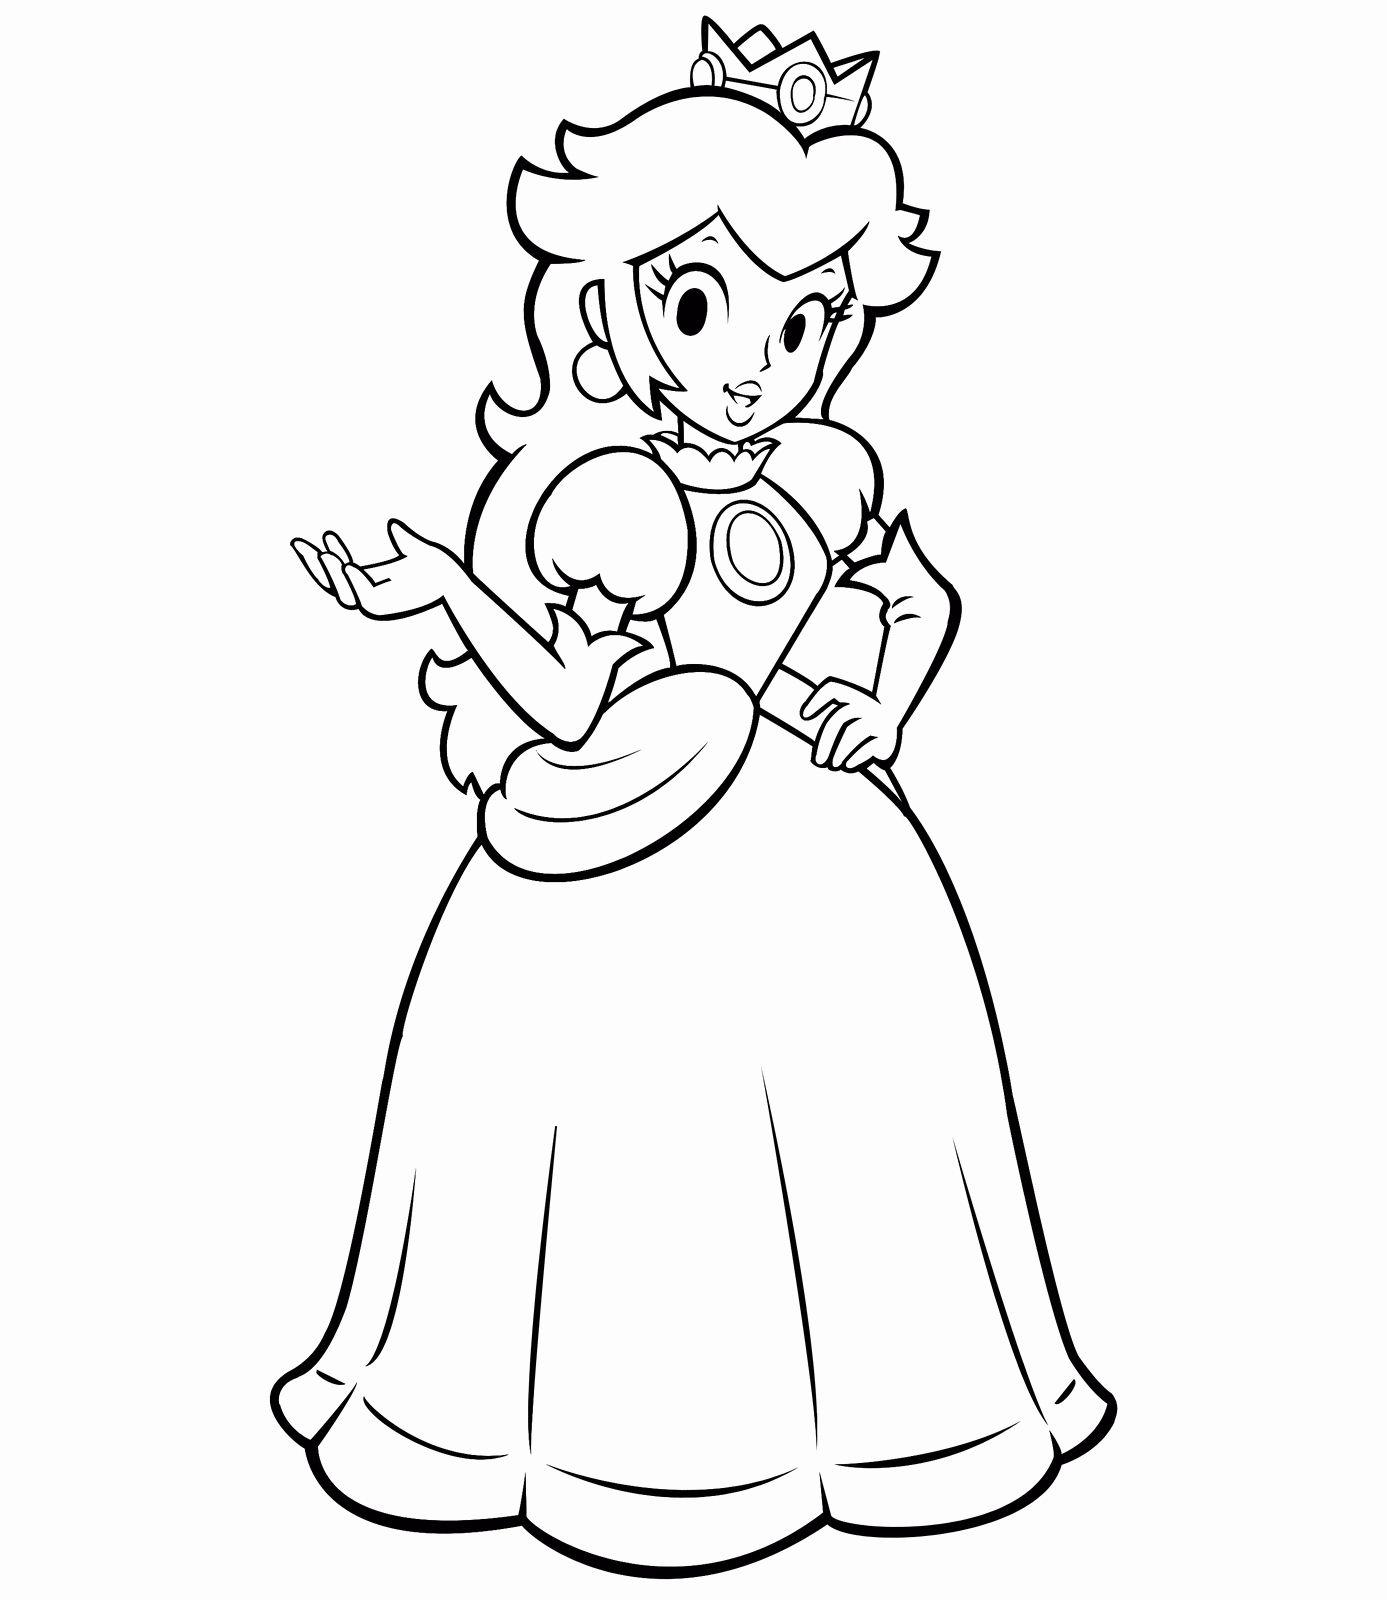 Princess Coloring Sheets Free Printable Lovely Printable Princess